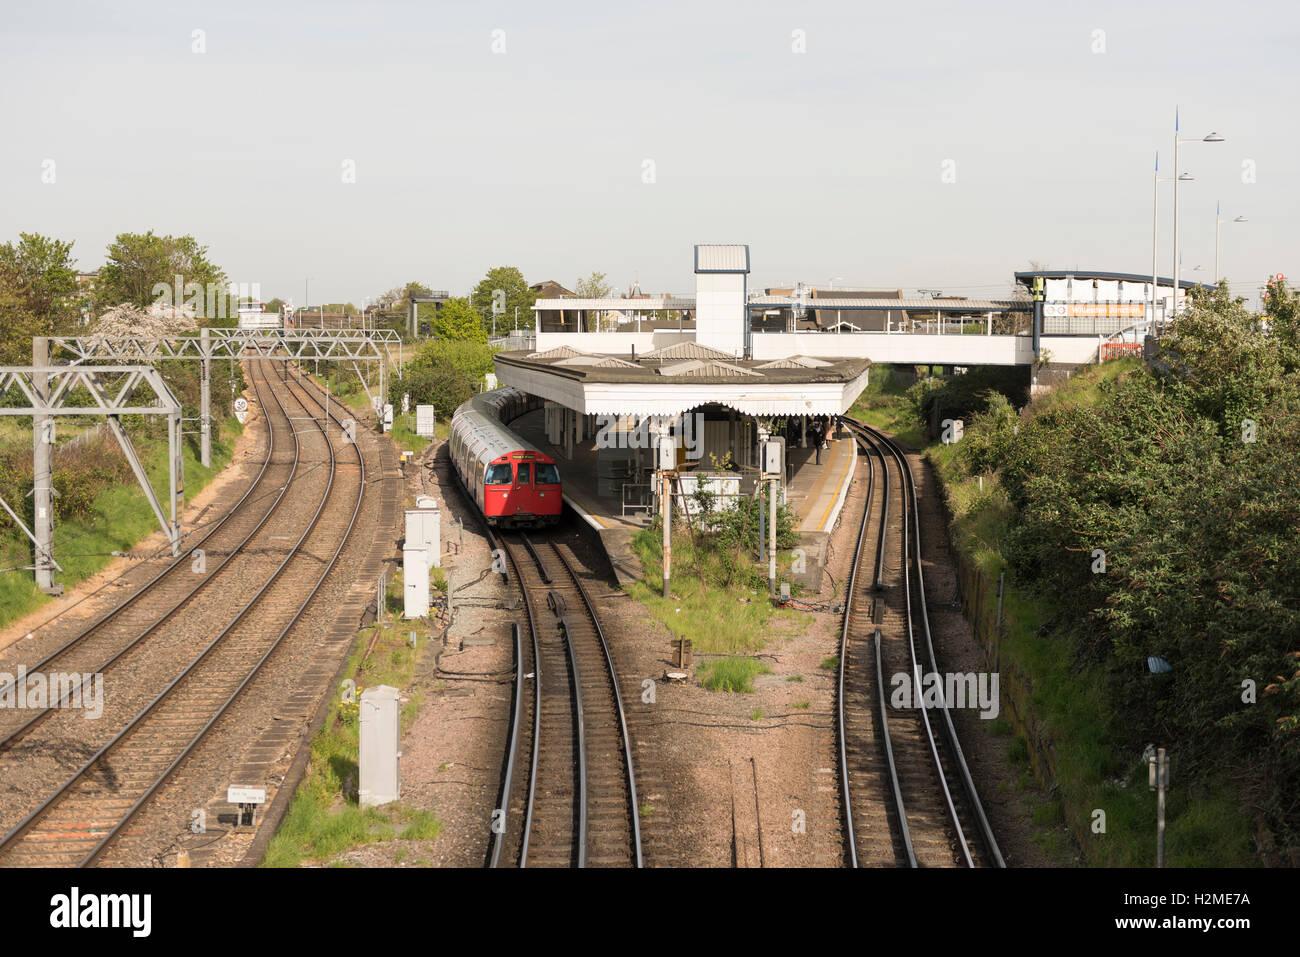 Willesden Junction Station, London, England - Stock Image